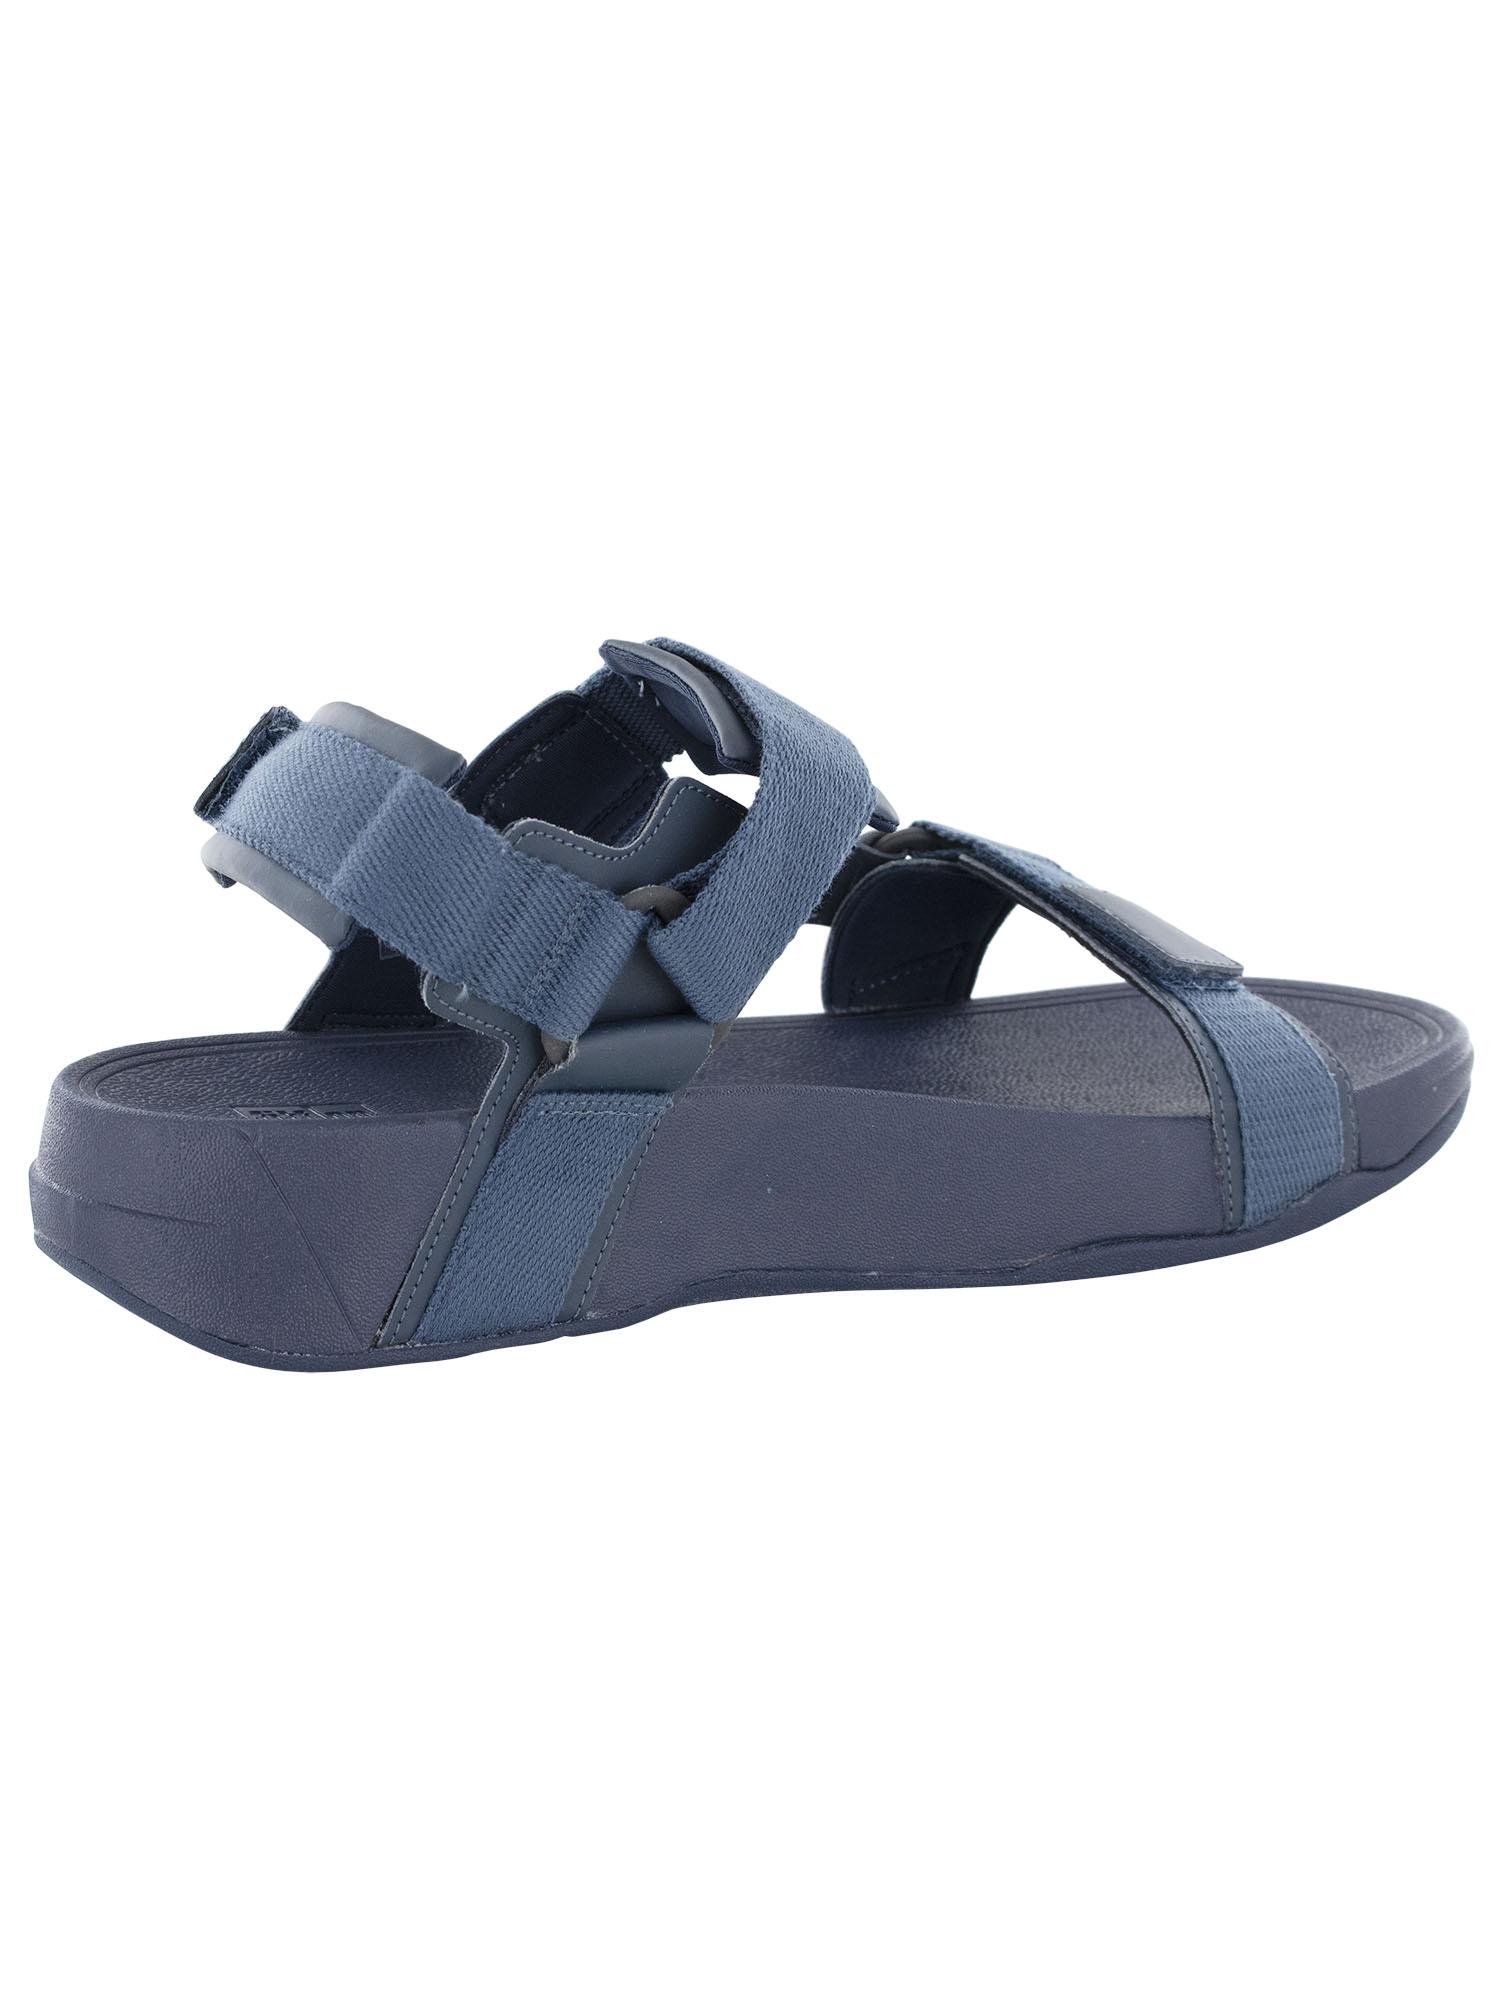 thumbnail 10 - Fitflop-Mens-Ryker-Webbing-Athletic-Sandal-Shoes